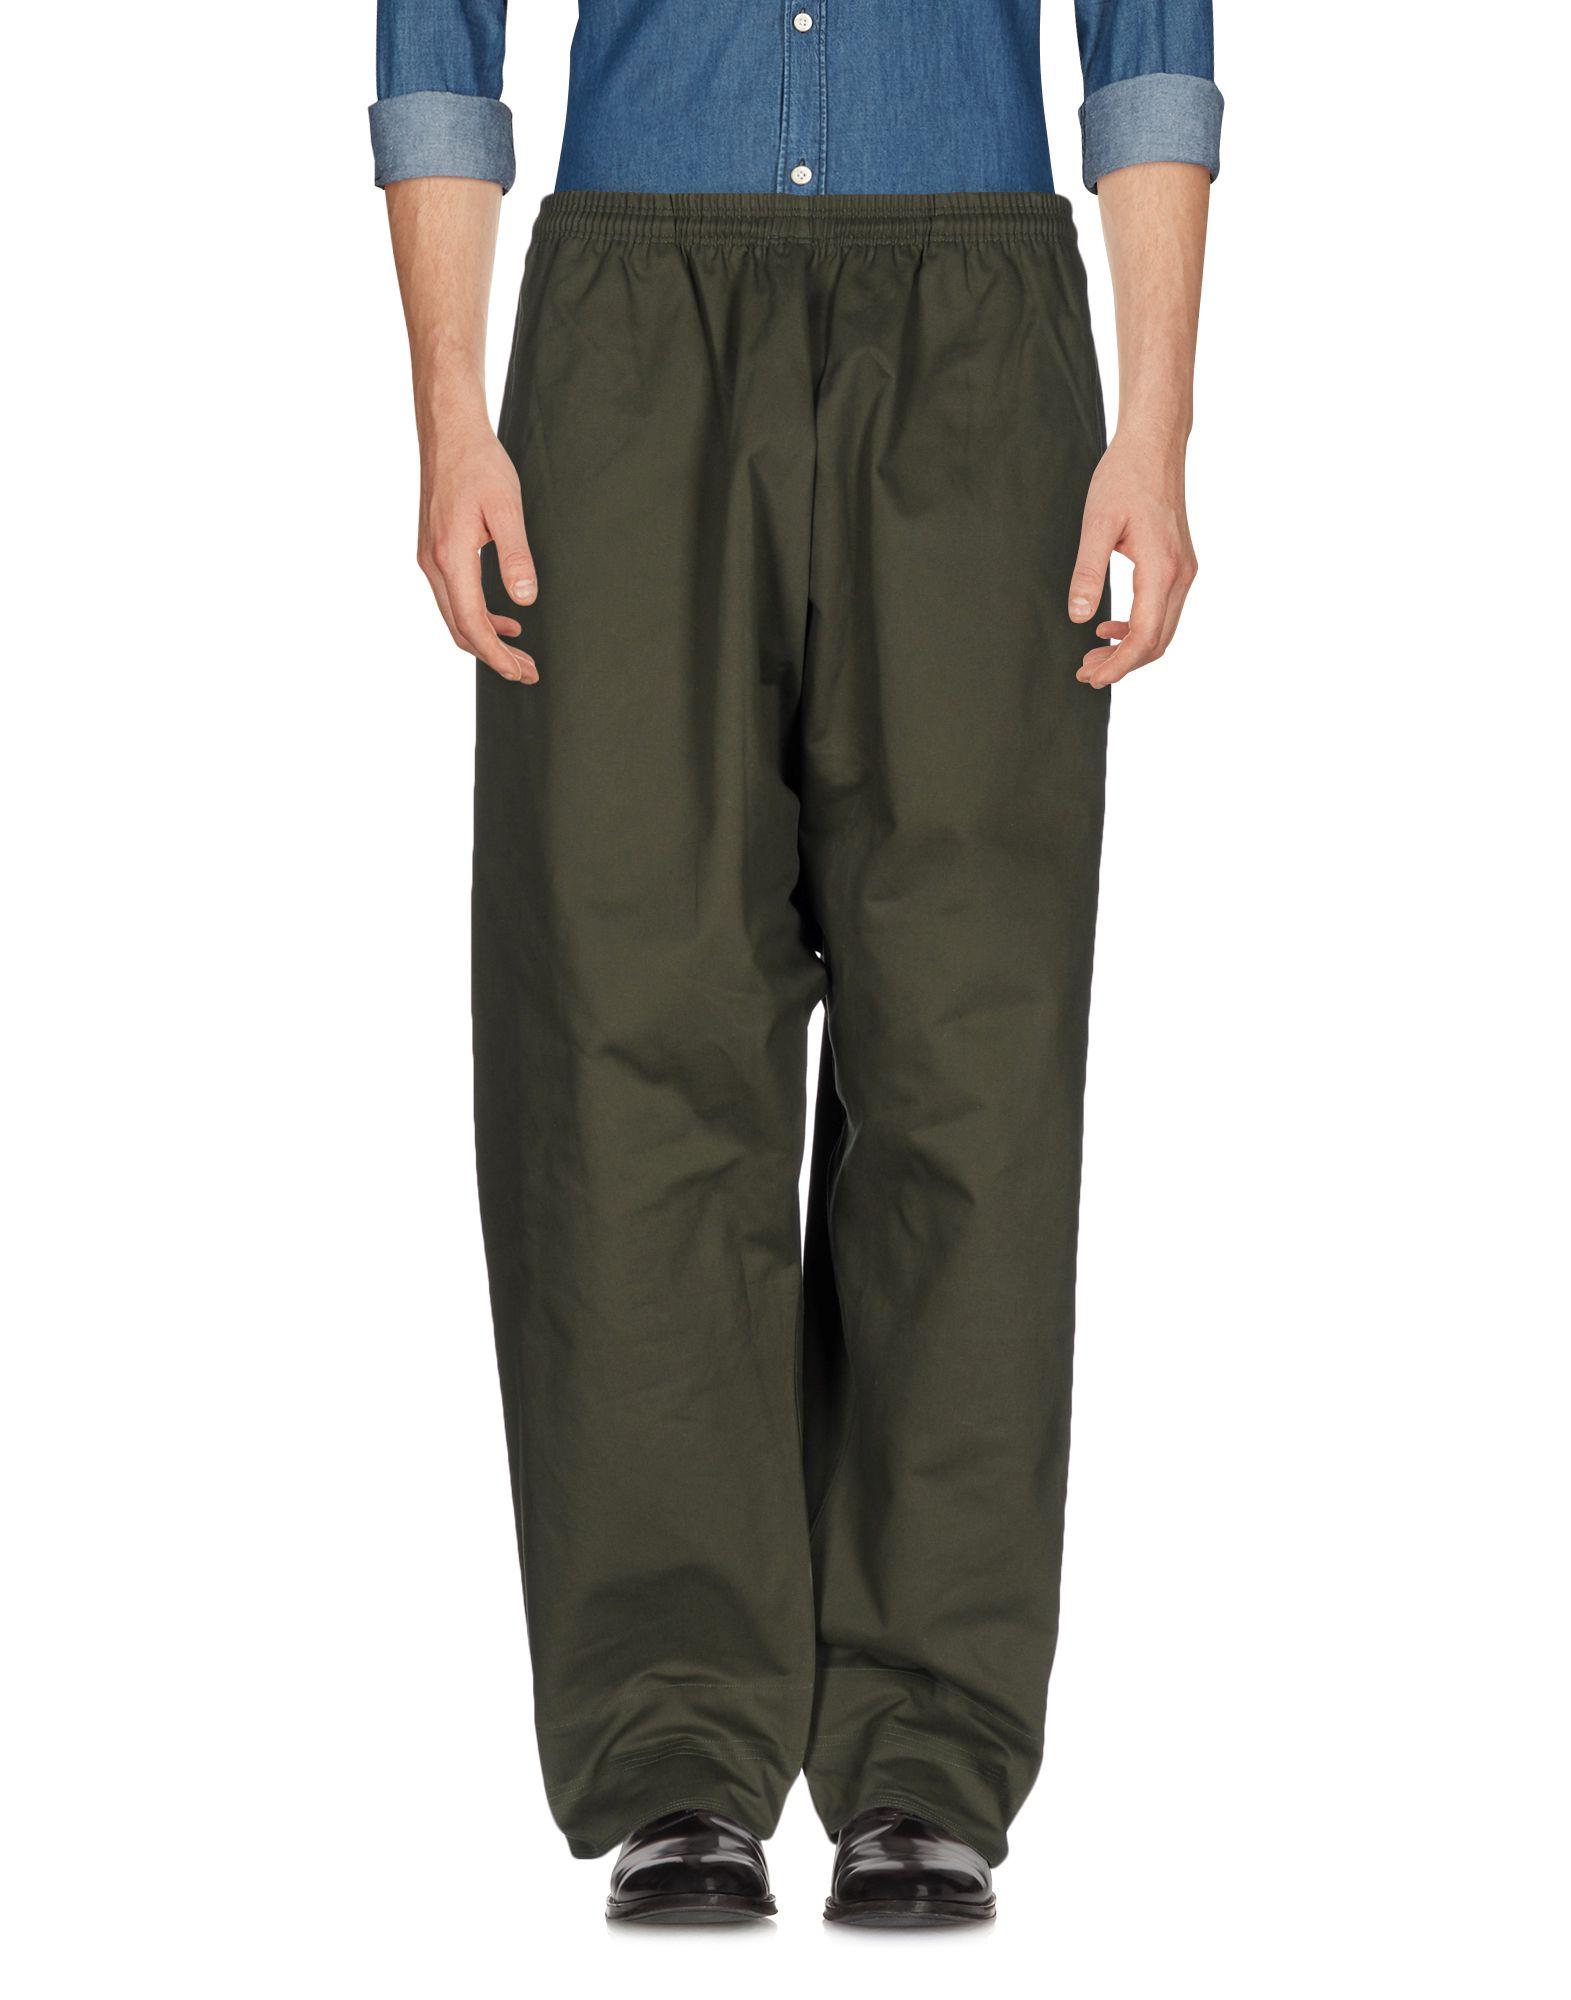 Pantalone Marcelo Marcelo Pantalone Burlon Uomo - 36934157RQ d82d15